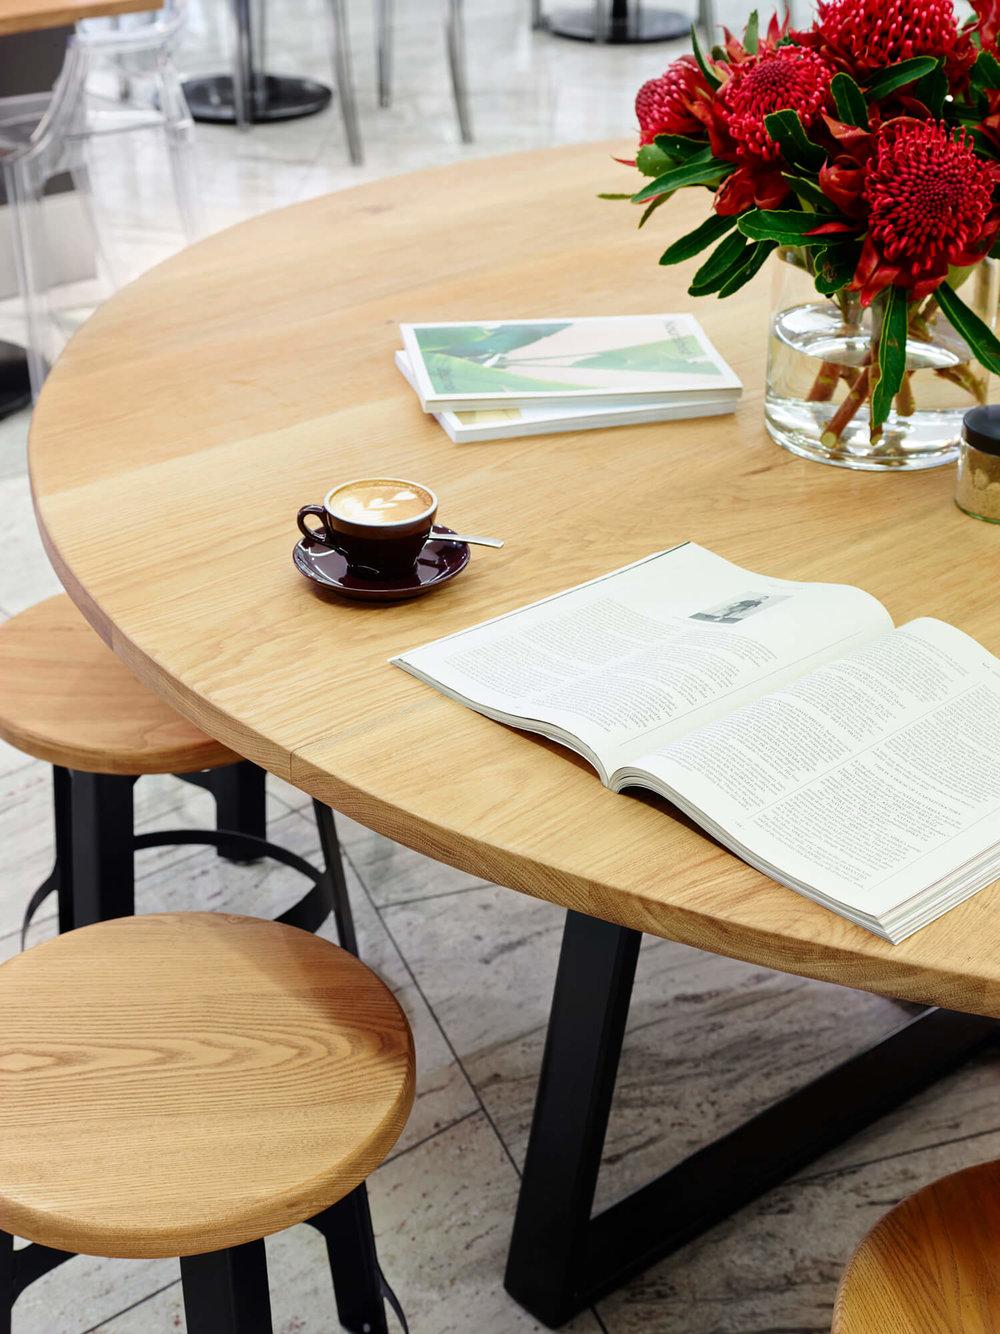 georgia-cannon-interior-designer-brisbane-project-irving-place-cafe-25569.jpg